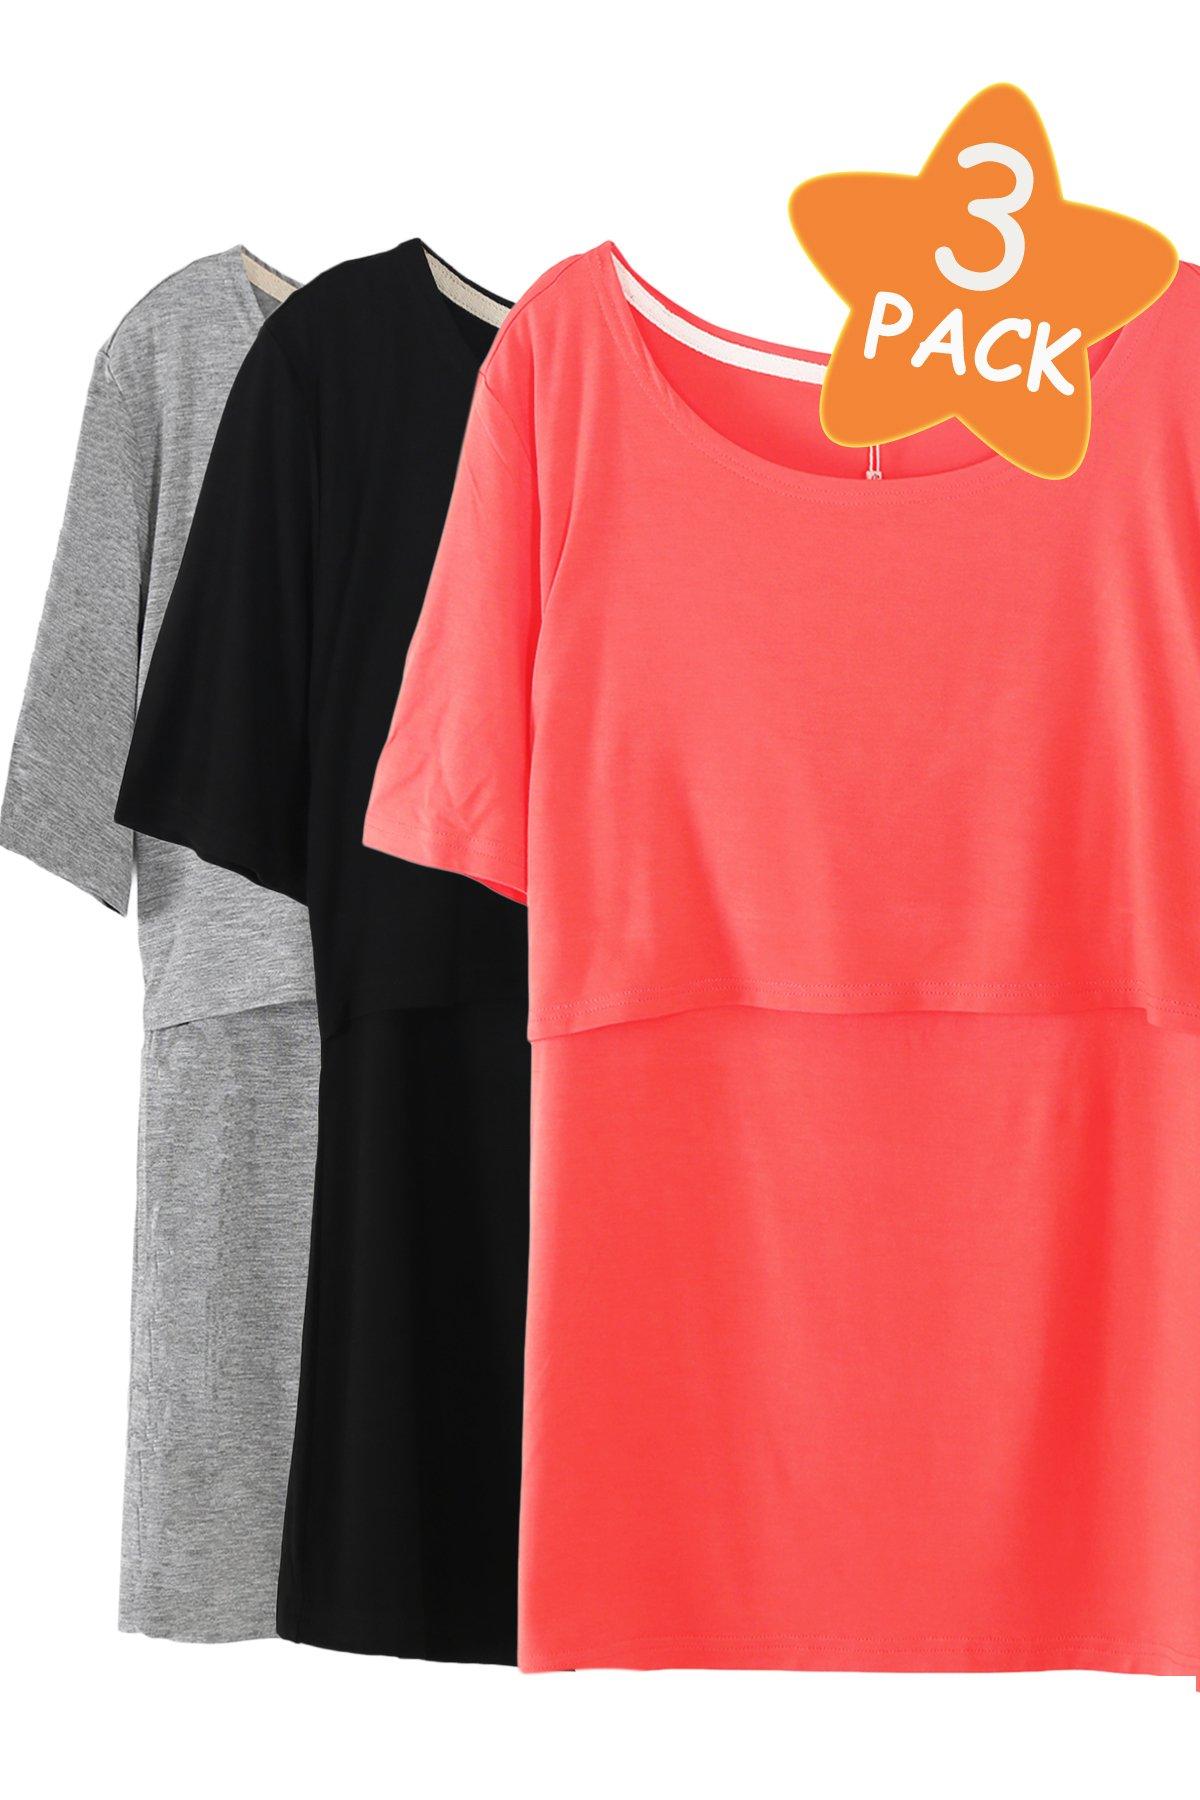 Smallshow 3 Pcs Maternity Nursing T-Shirt Nursing Tops,Orange-Black-Grey,XX-Large by Smallshow